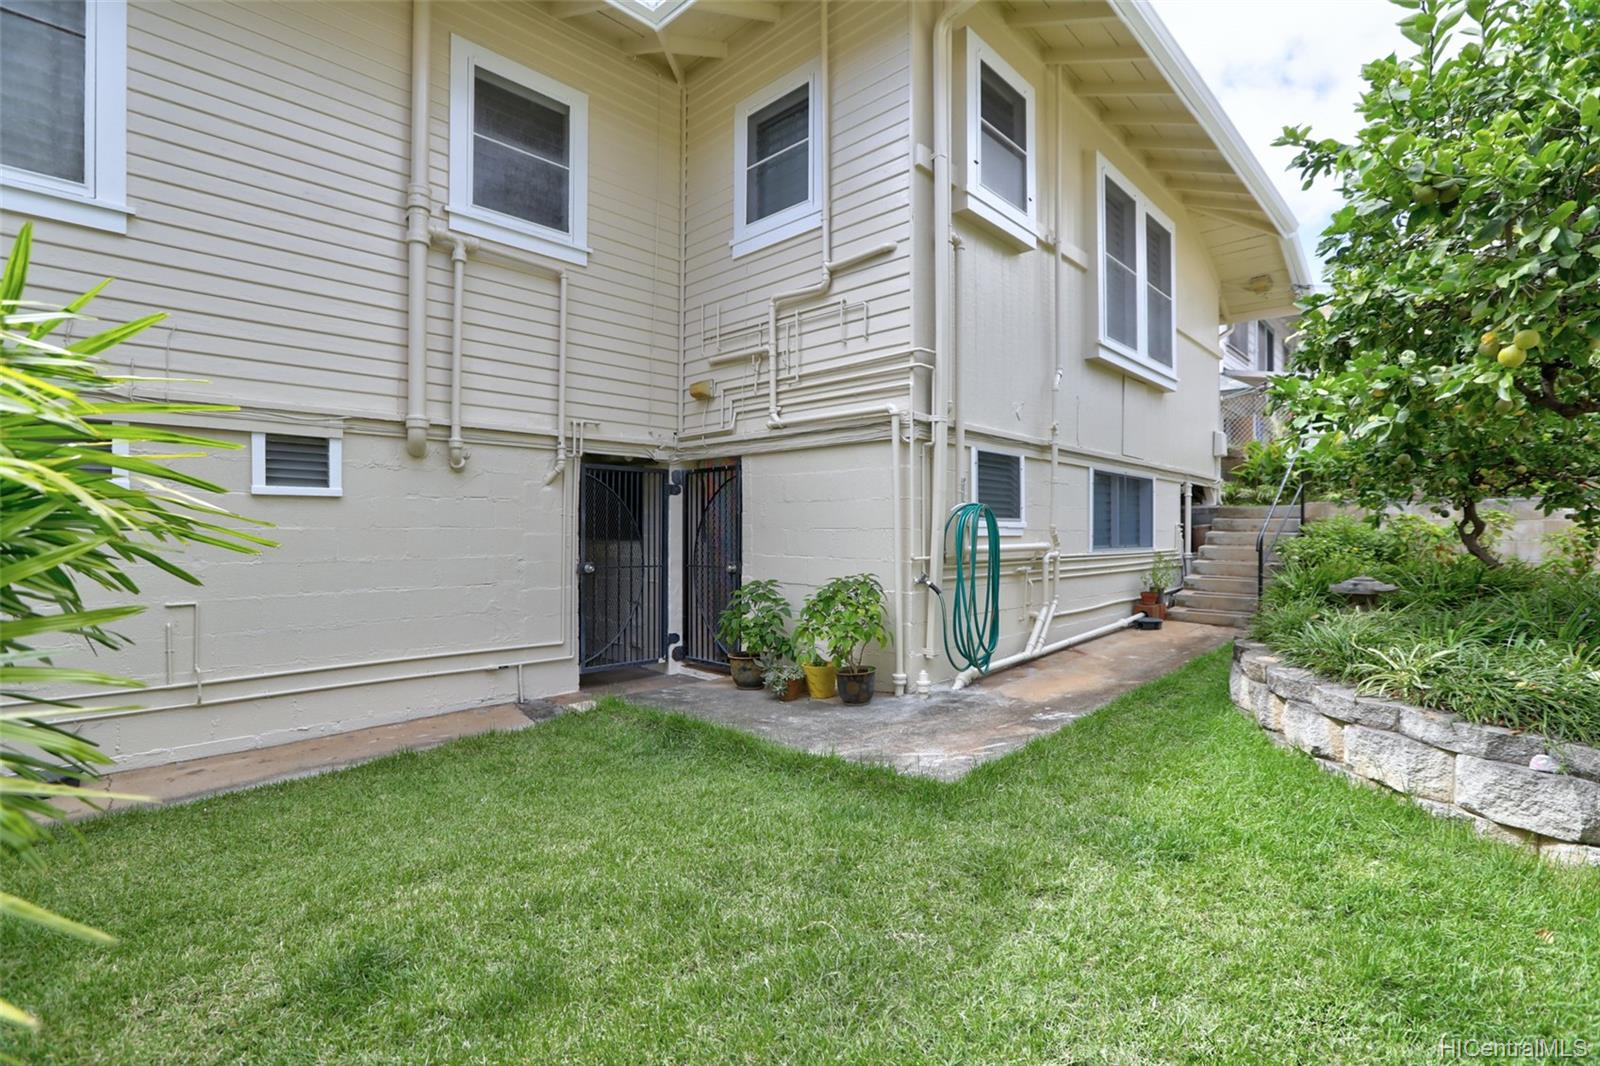 810 Green Street Honolulu - Multi-family - photo 25 of 25